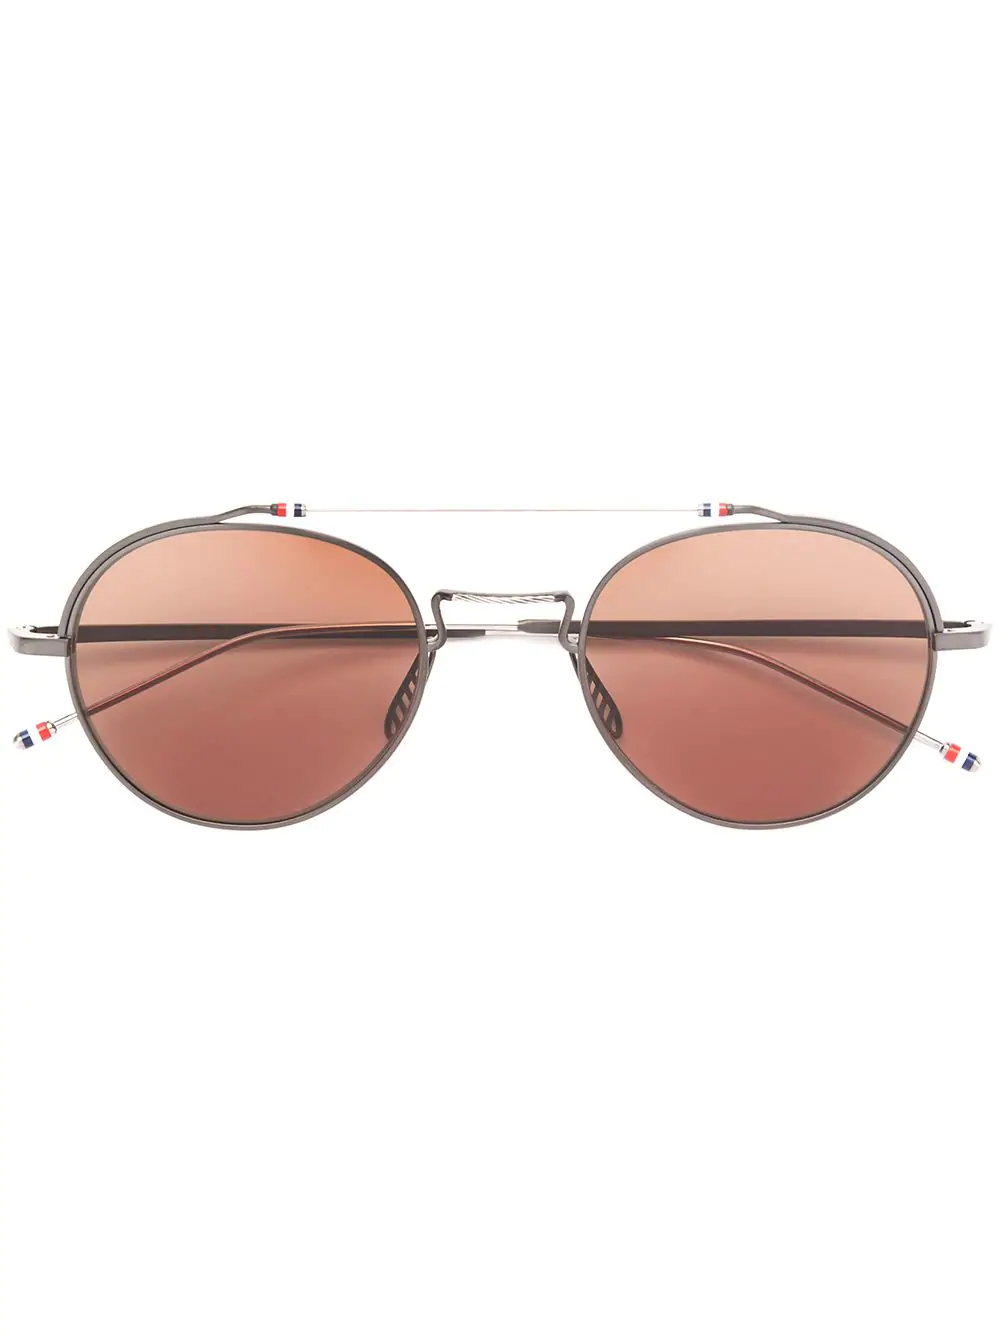 9656f1e47bdd Thom Browne Eyewear Black Iron   Silver Sunglasses